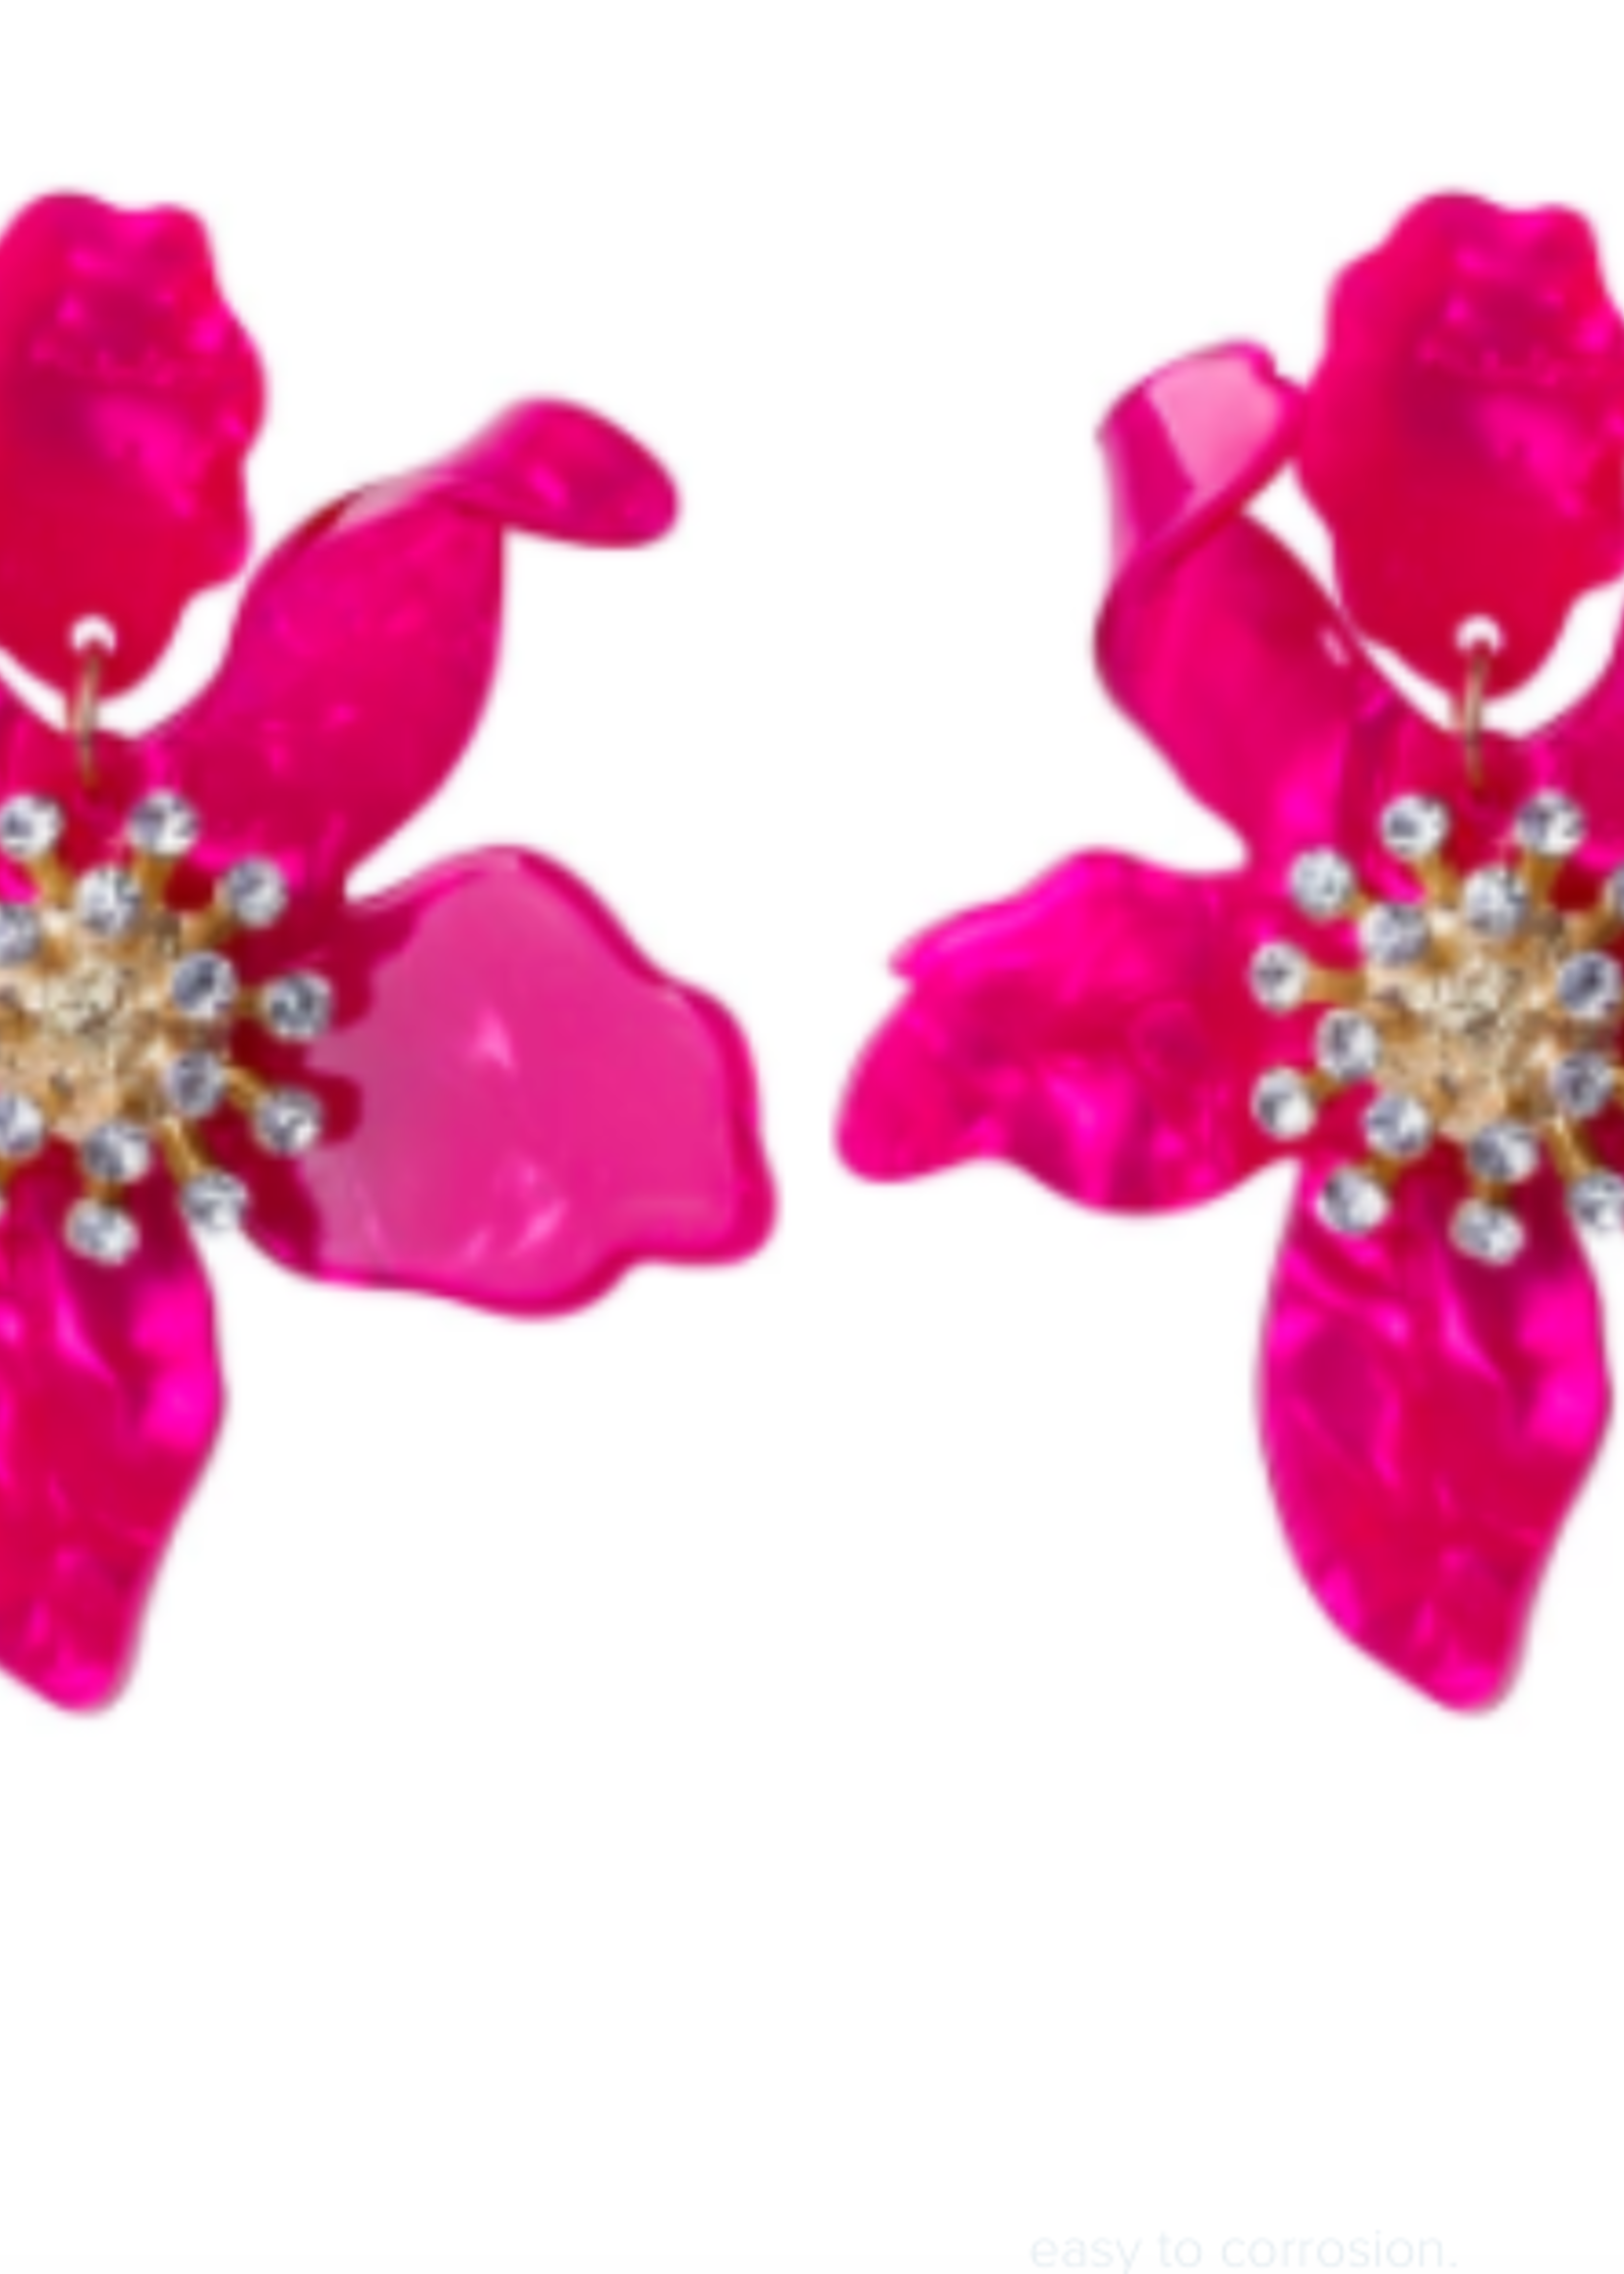 Smith & Co LS SFY Flamingo Pink Earrings